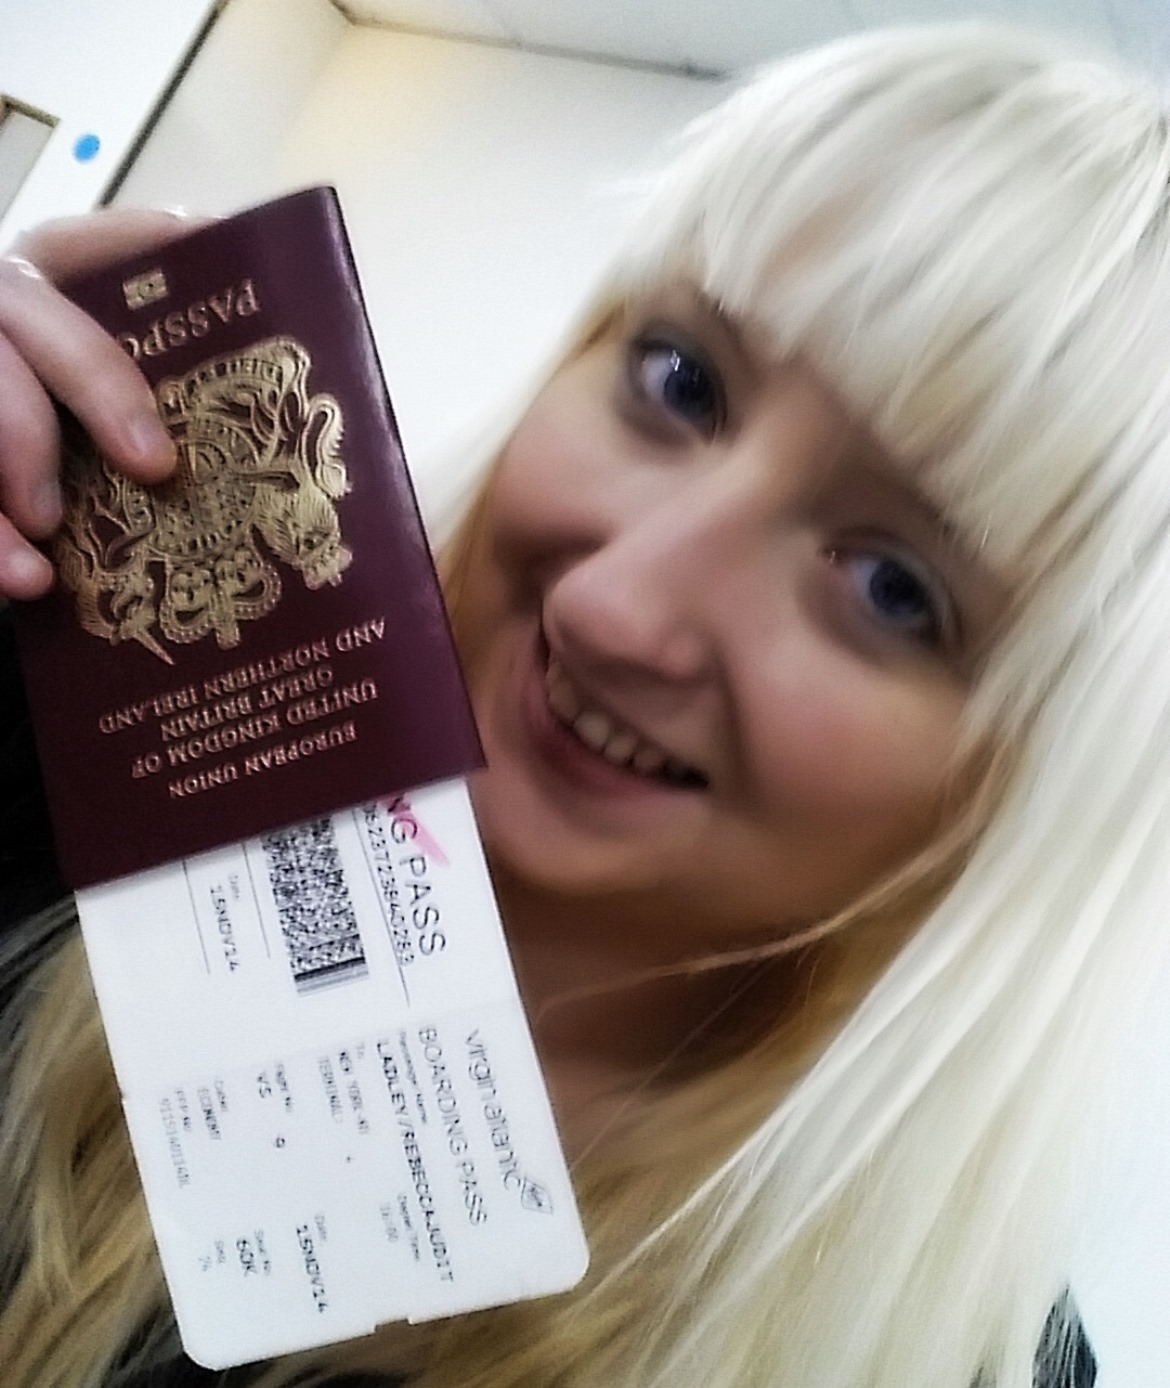 My ticket to New York City - New York New York, travel blog by BeckyBecky Blogs